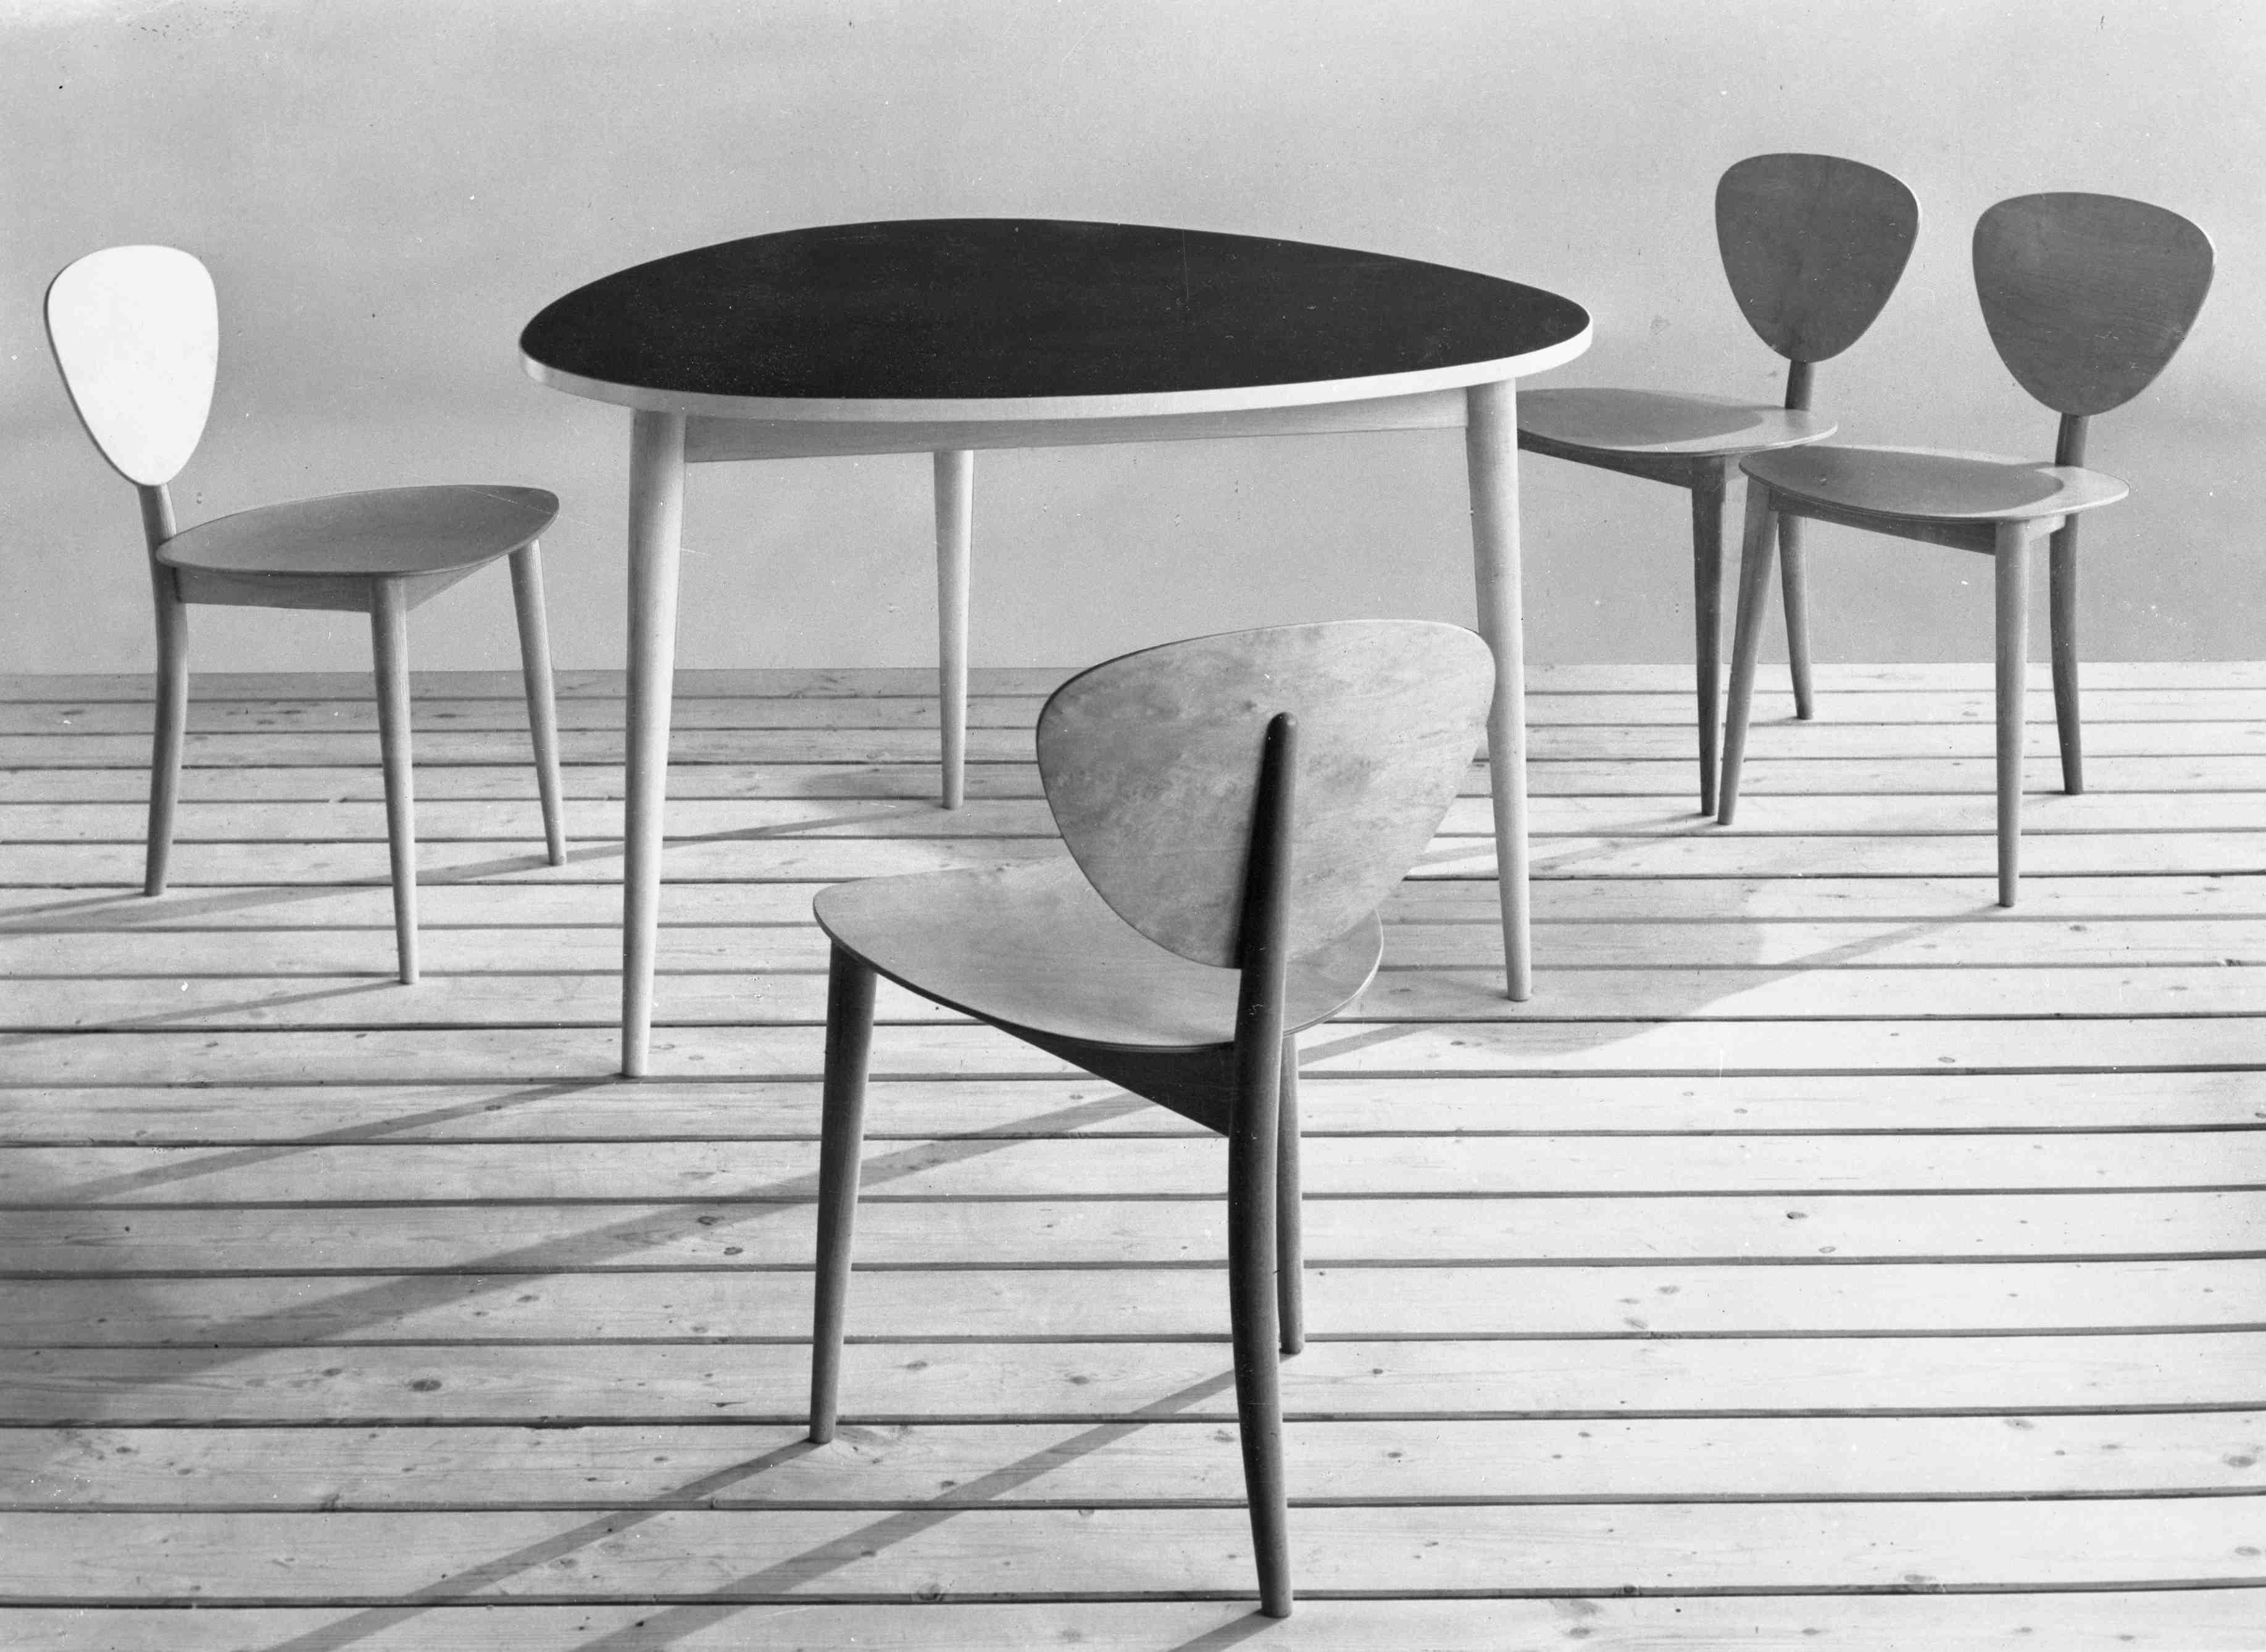 kultur kontext max bill aspekte seines werkes. Black Bedroom Furniture Sets. Home Design Ideas